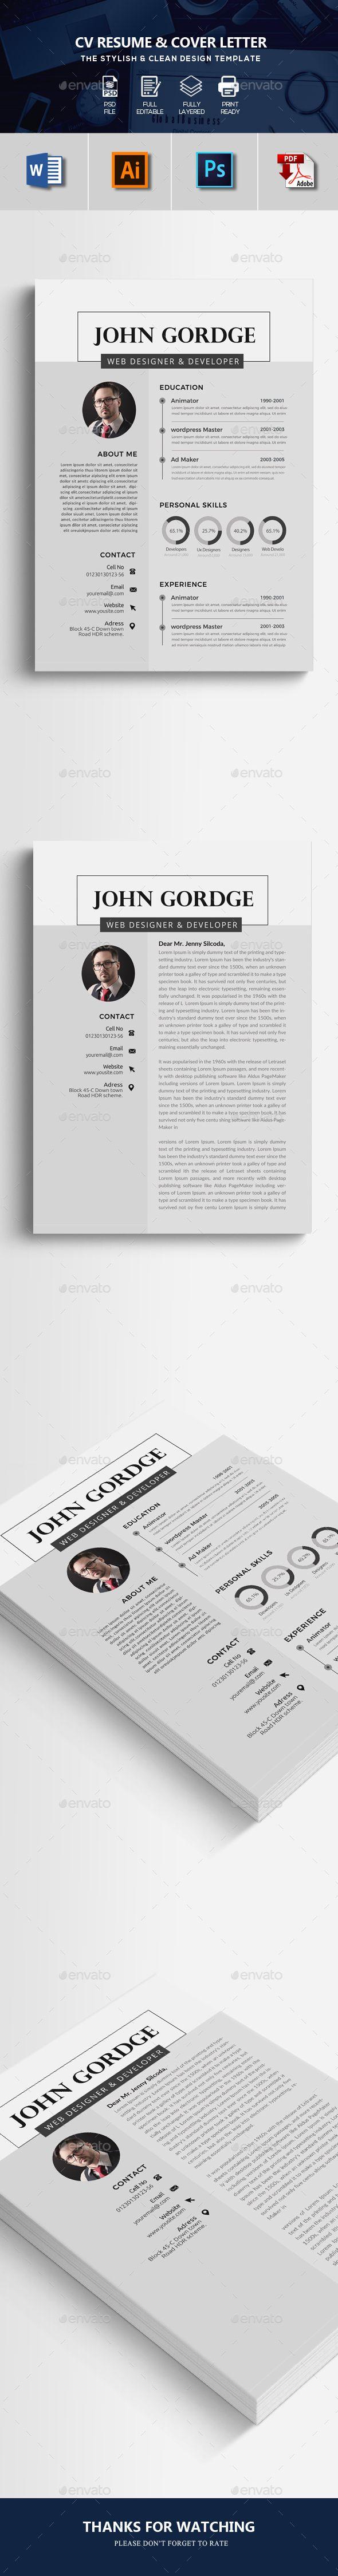 CV Resume Word Format Resumes Stationery